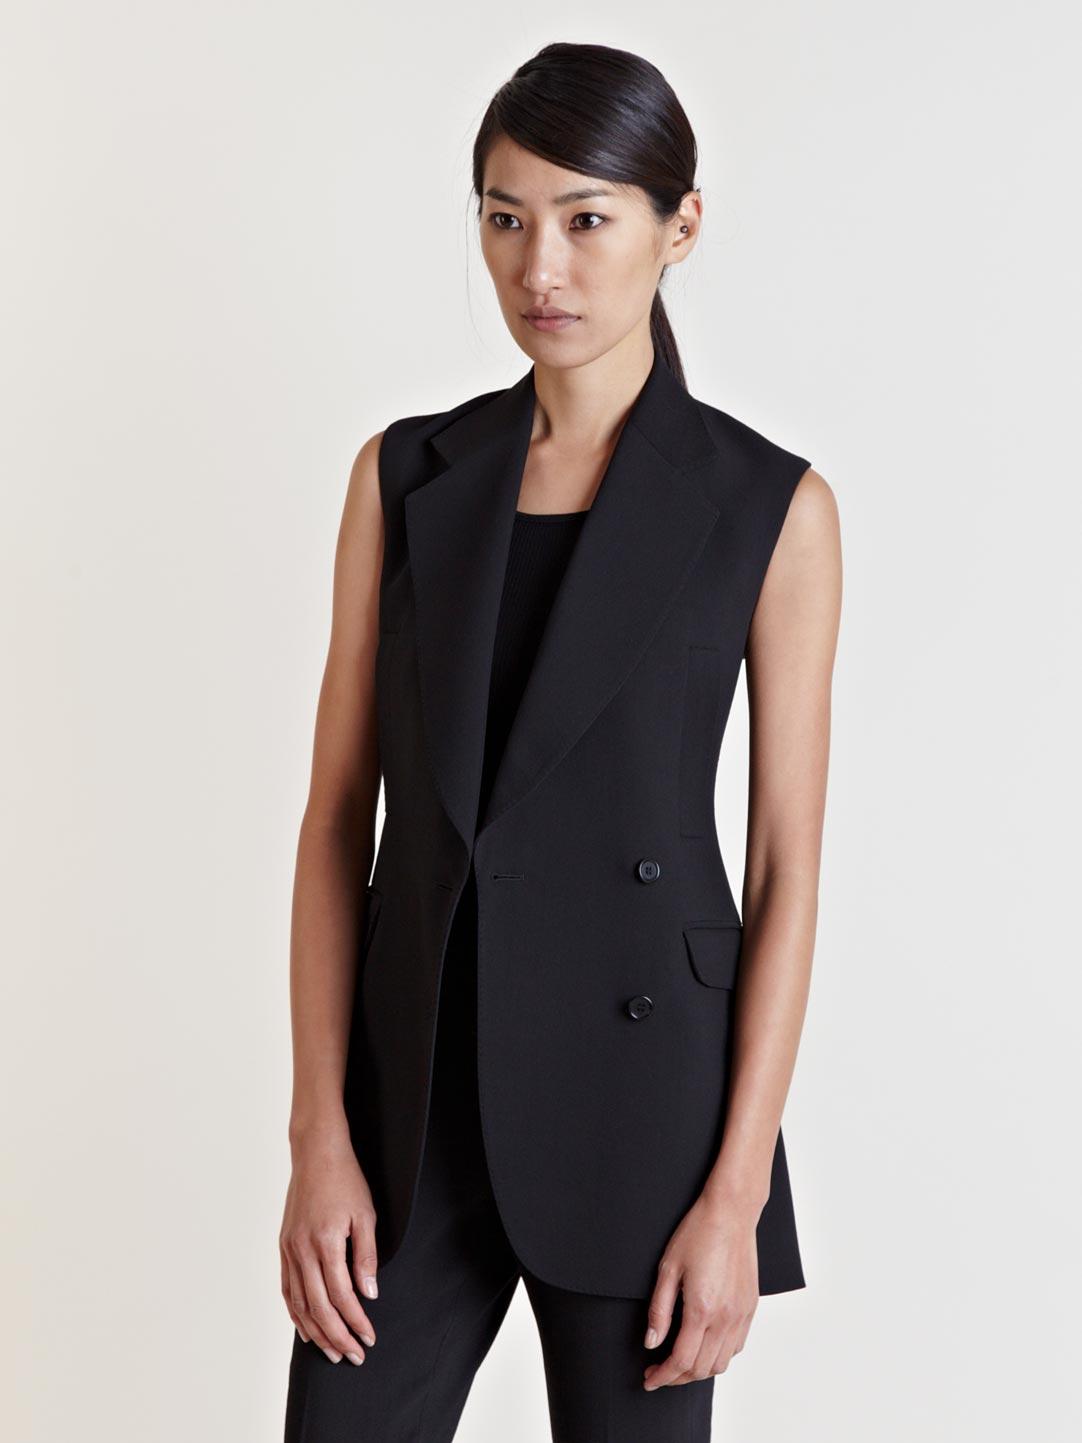 Womens dress jackets blazers